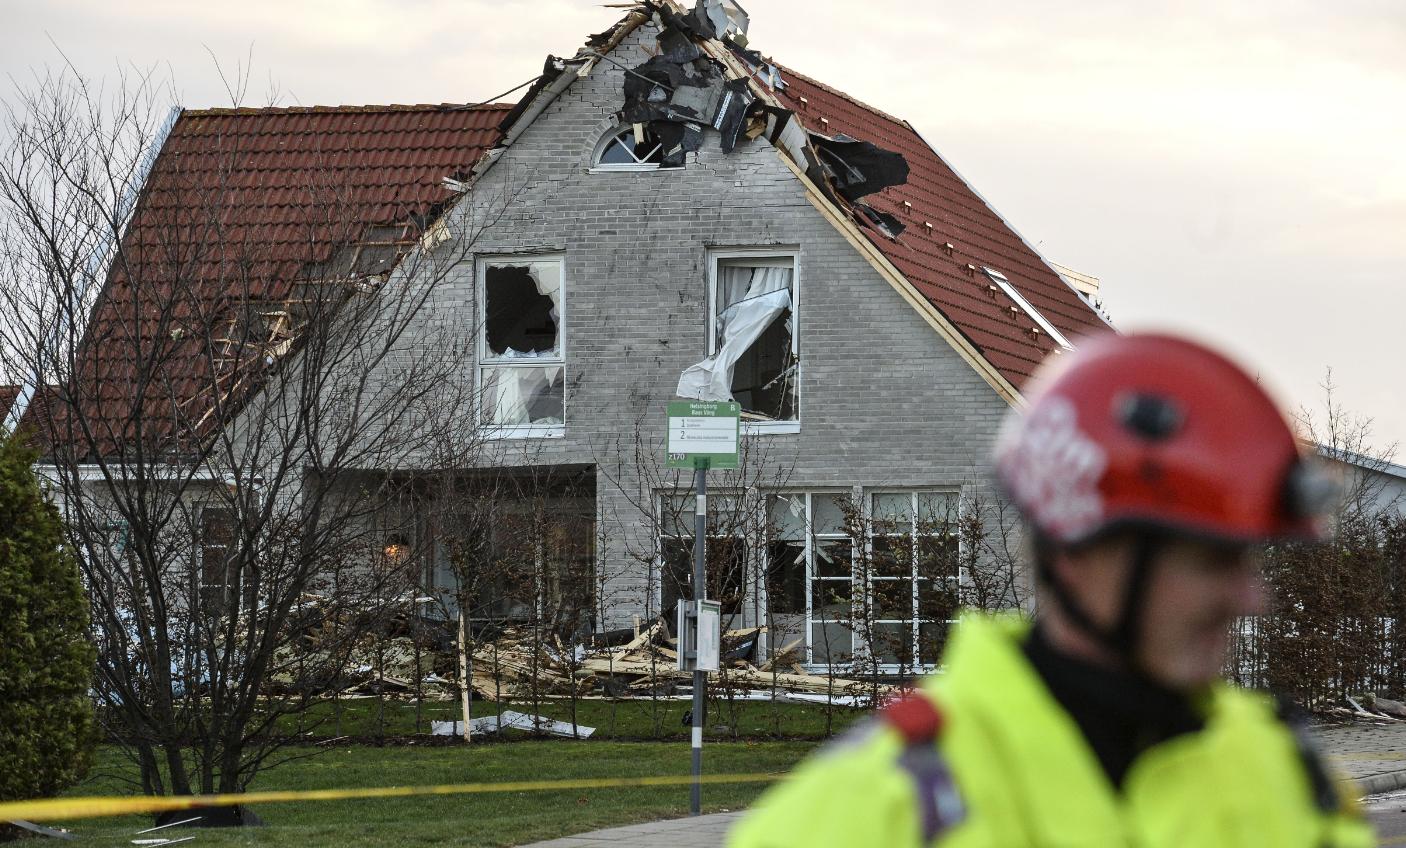 A house damaged by storm Gorm in Helsingborg Sweden on November 30, 2015. (Johan Nilsson/TT/AFP/Getty Images)